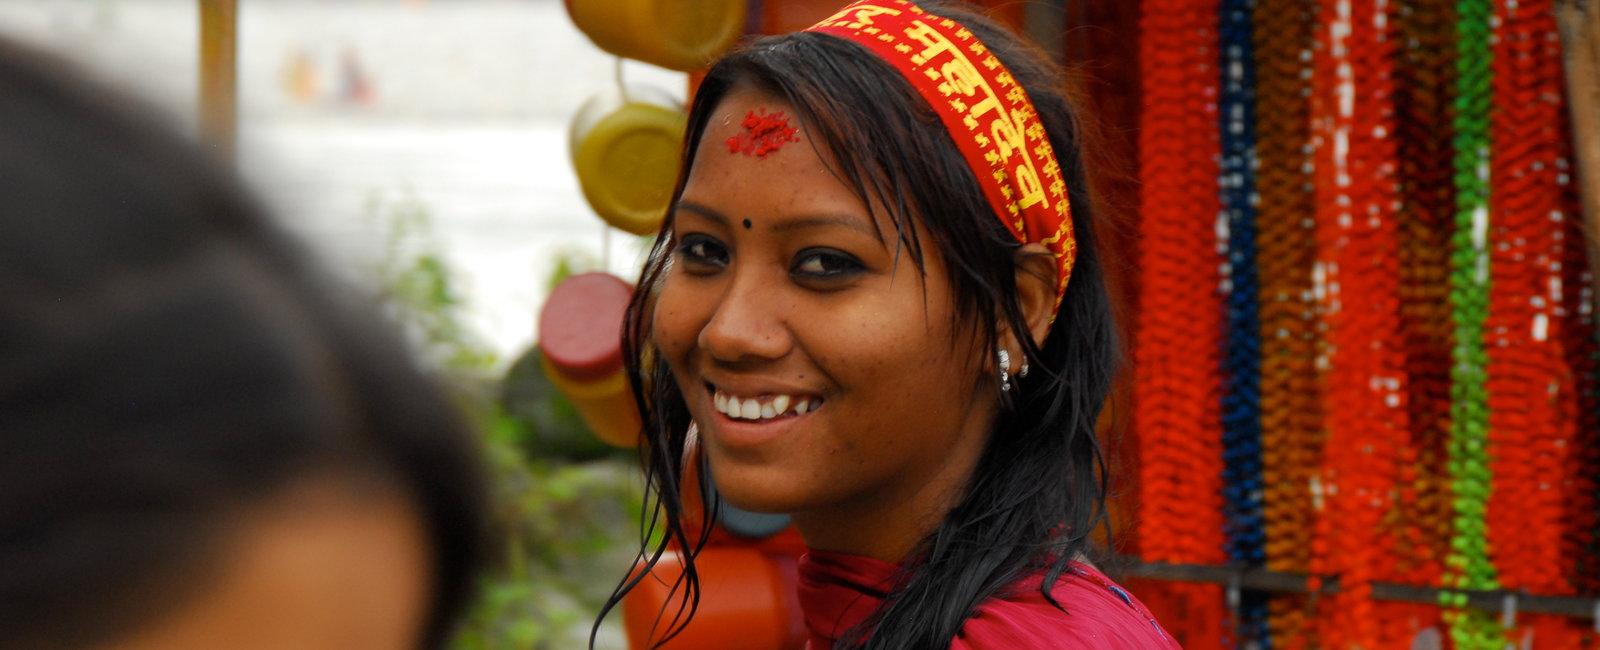 Tyler Vachon - Radiography Electives in Pokhara, Nepal